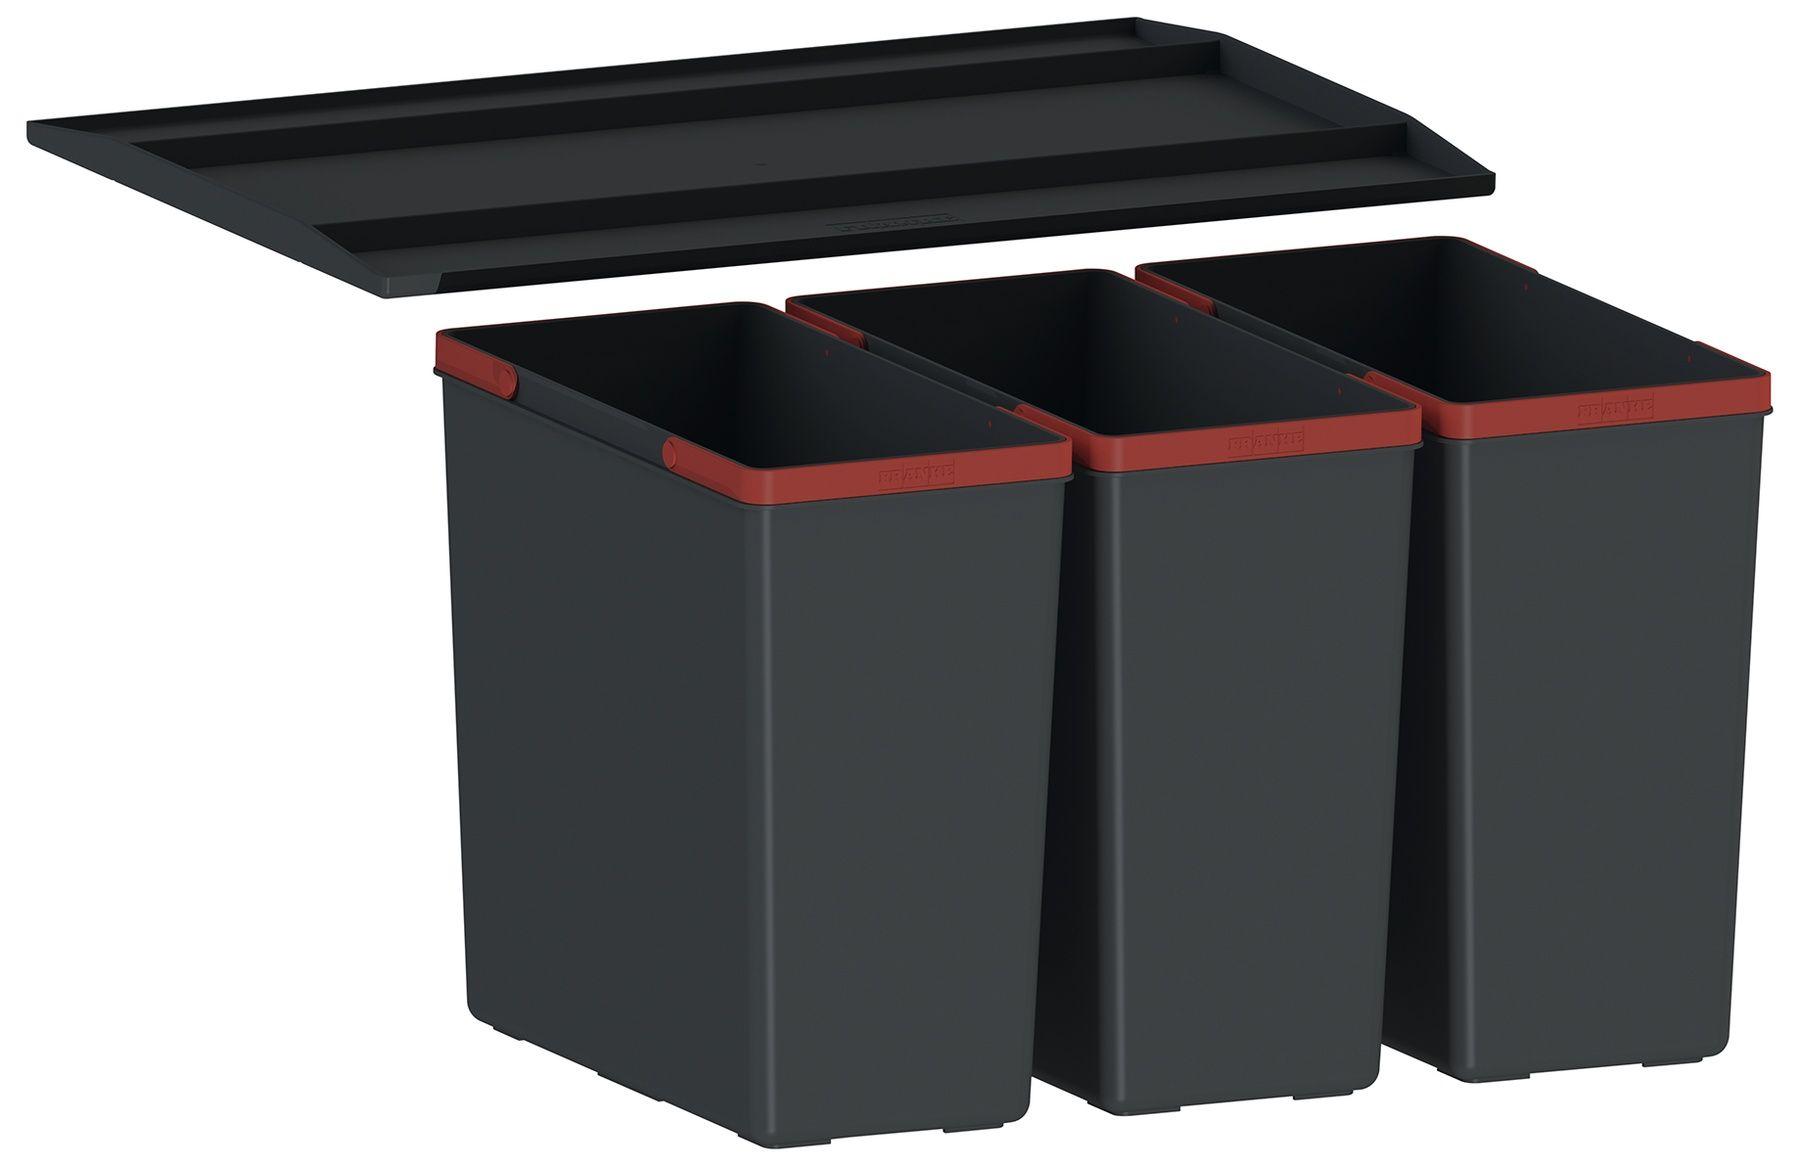 Odpadkový koš Franke Sorter EasySort 600-3-0, 3x 14,5 l